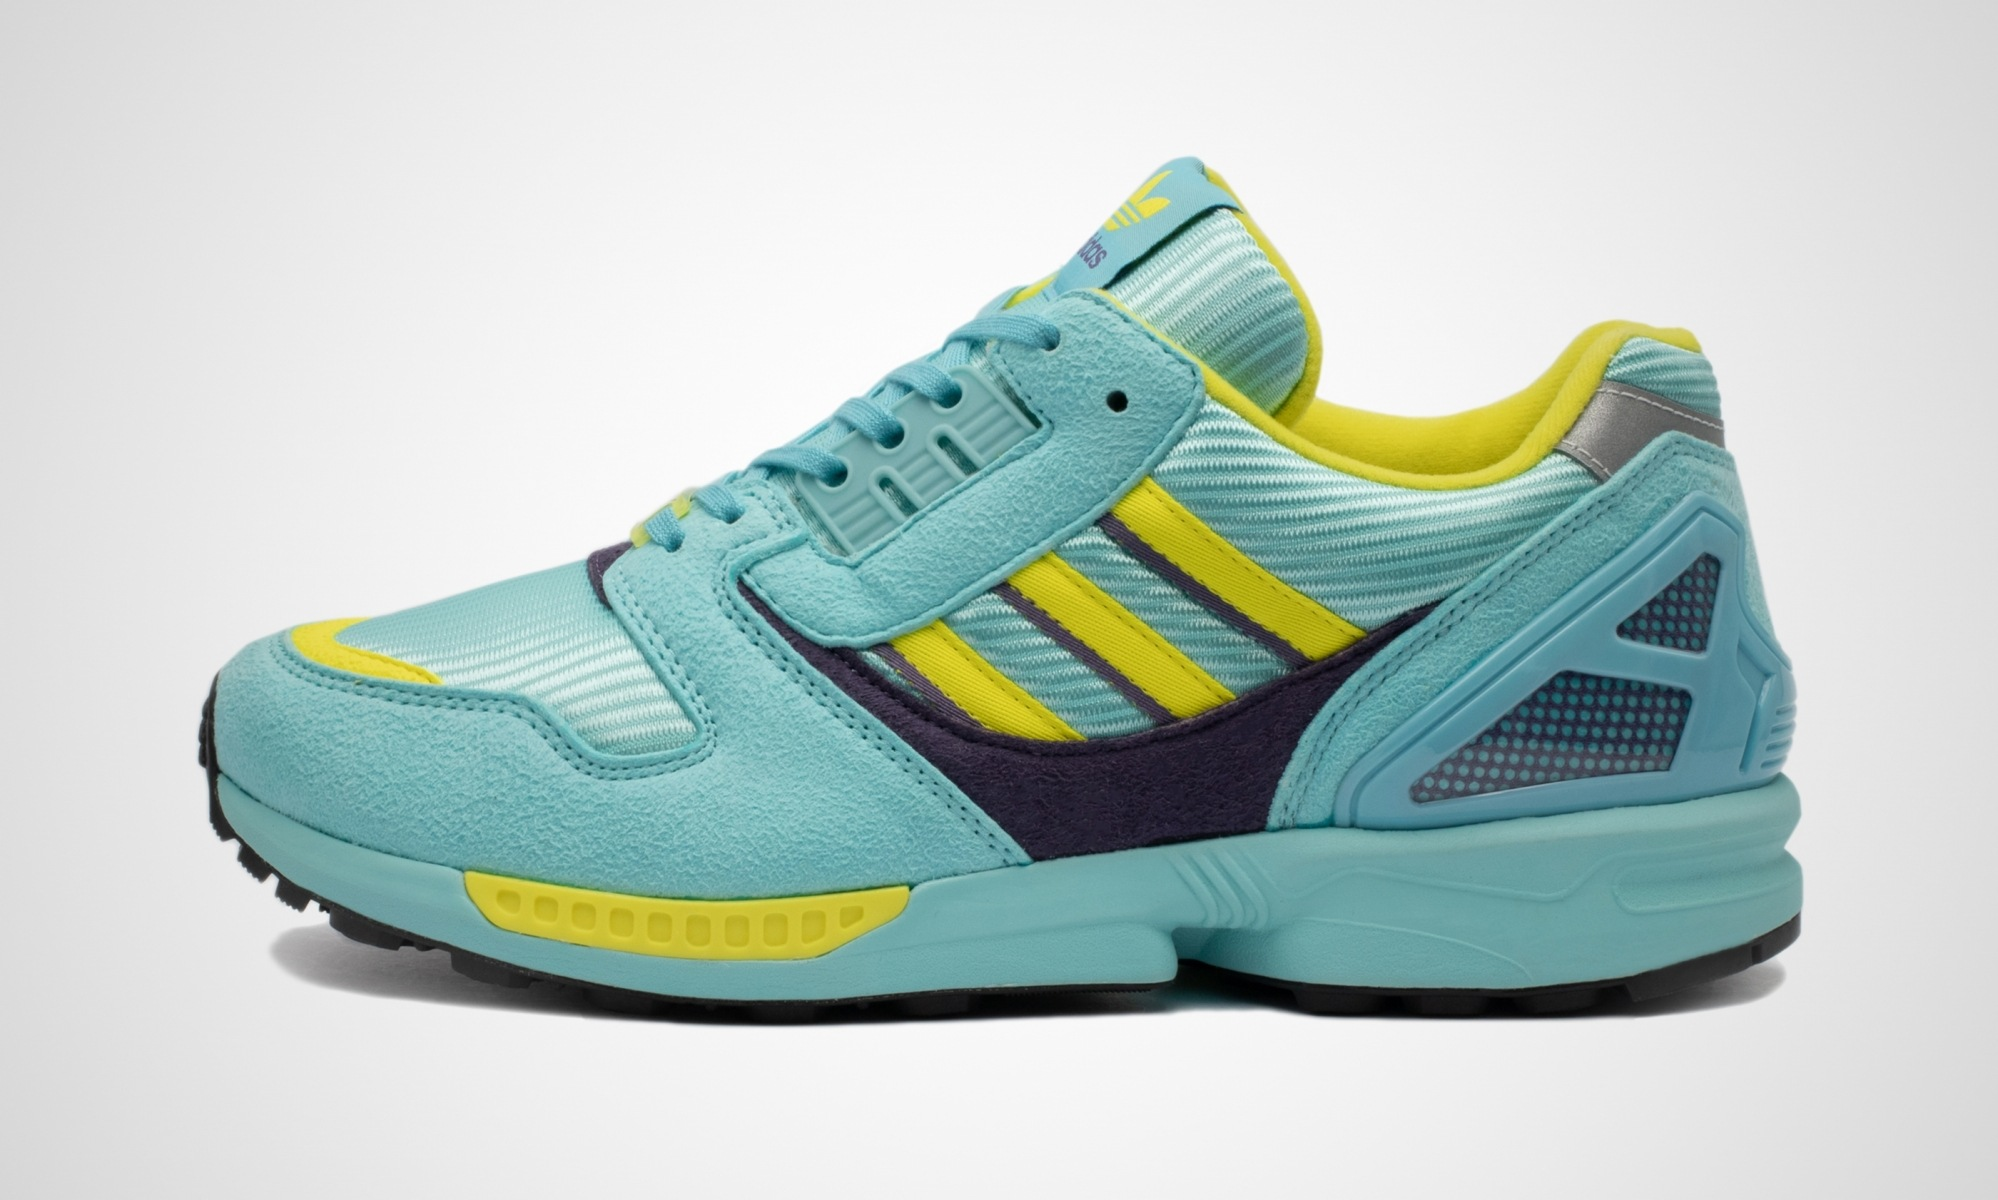 adidas aqua zx 8000 \u003e Clearance shop